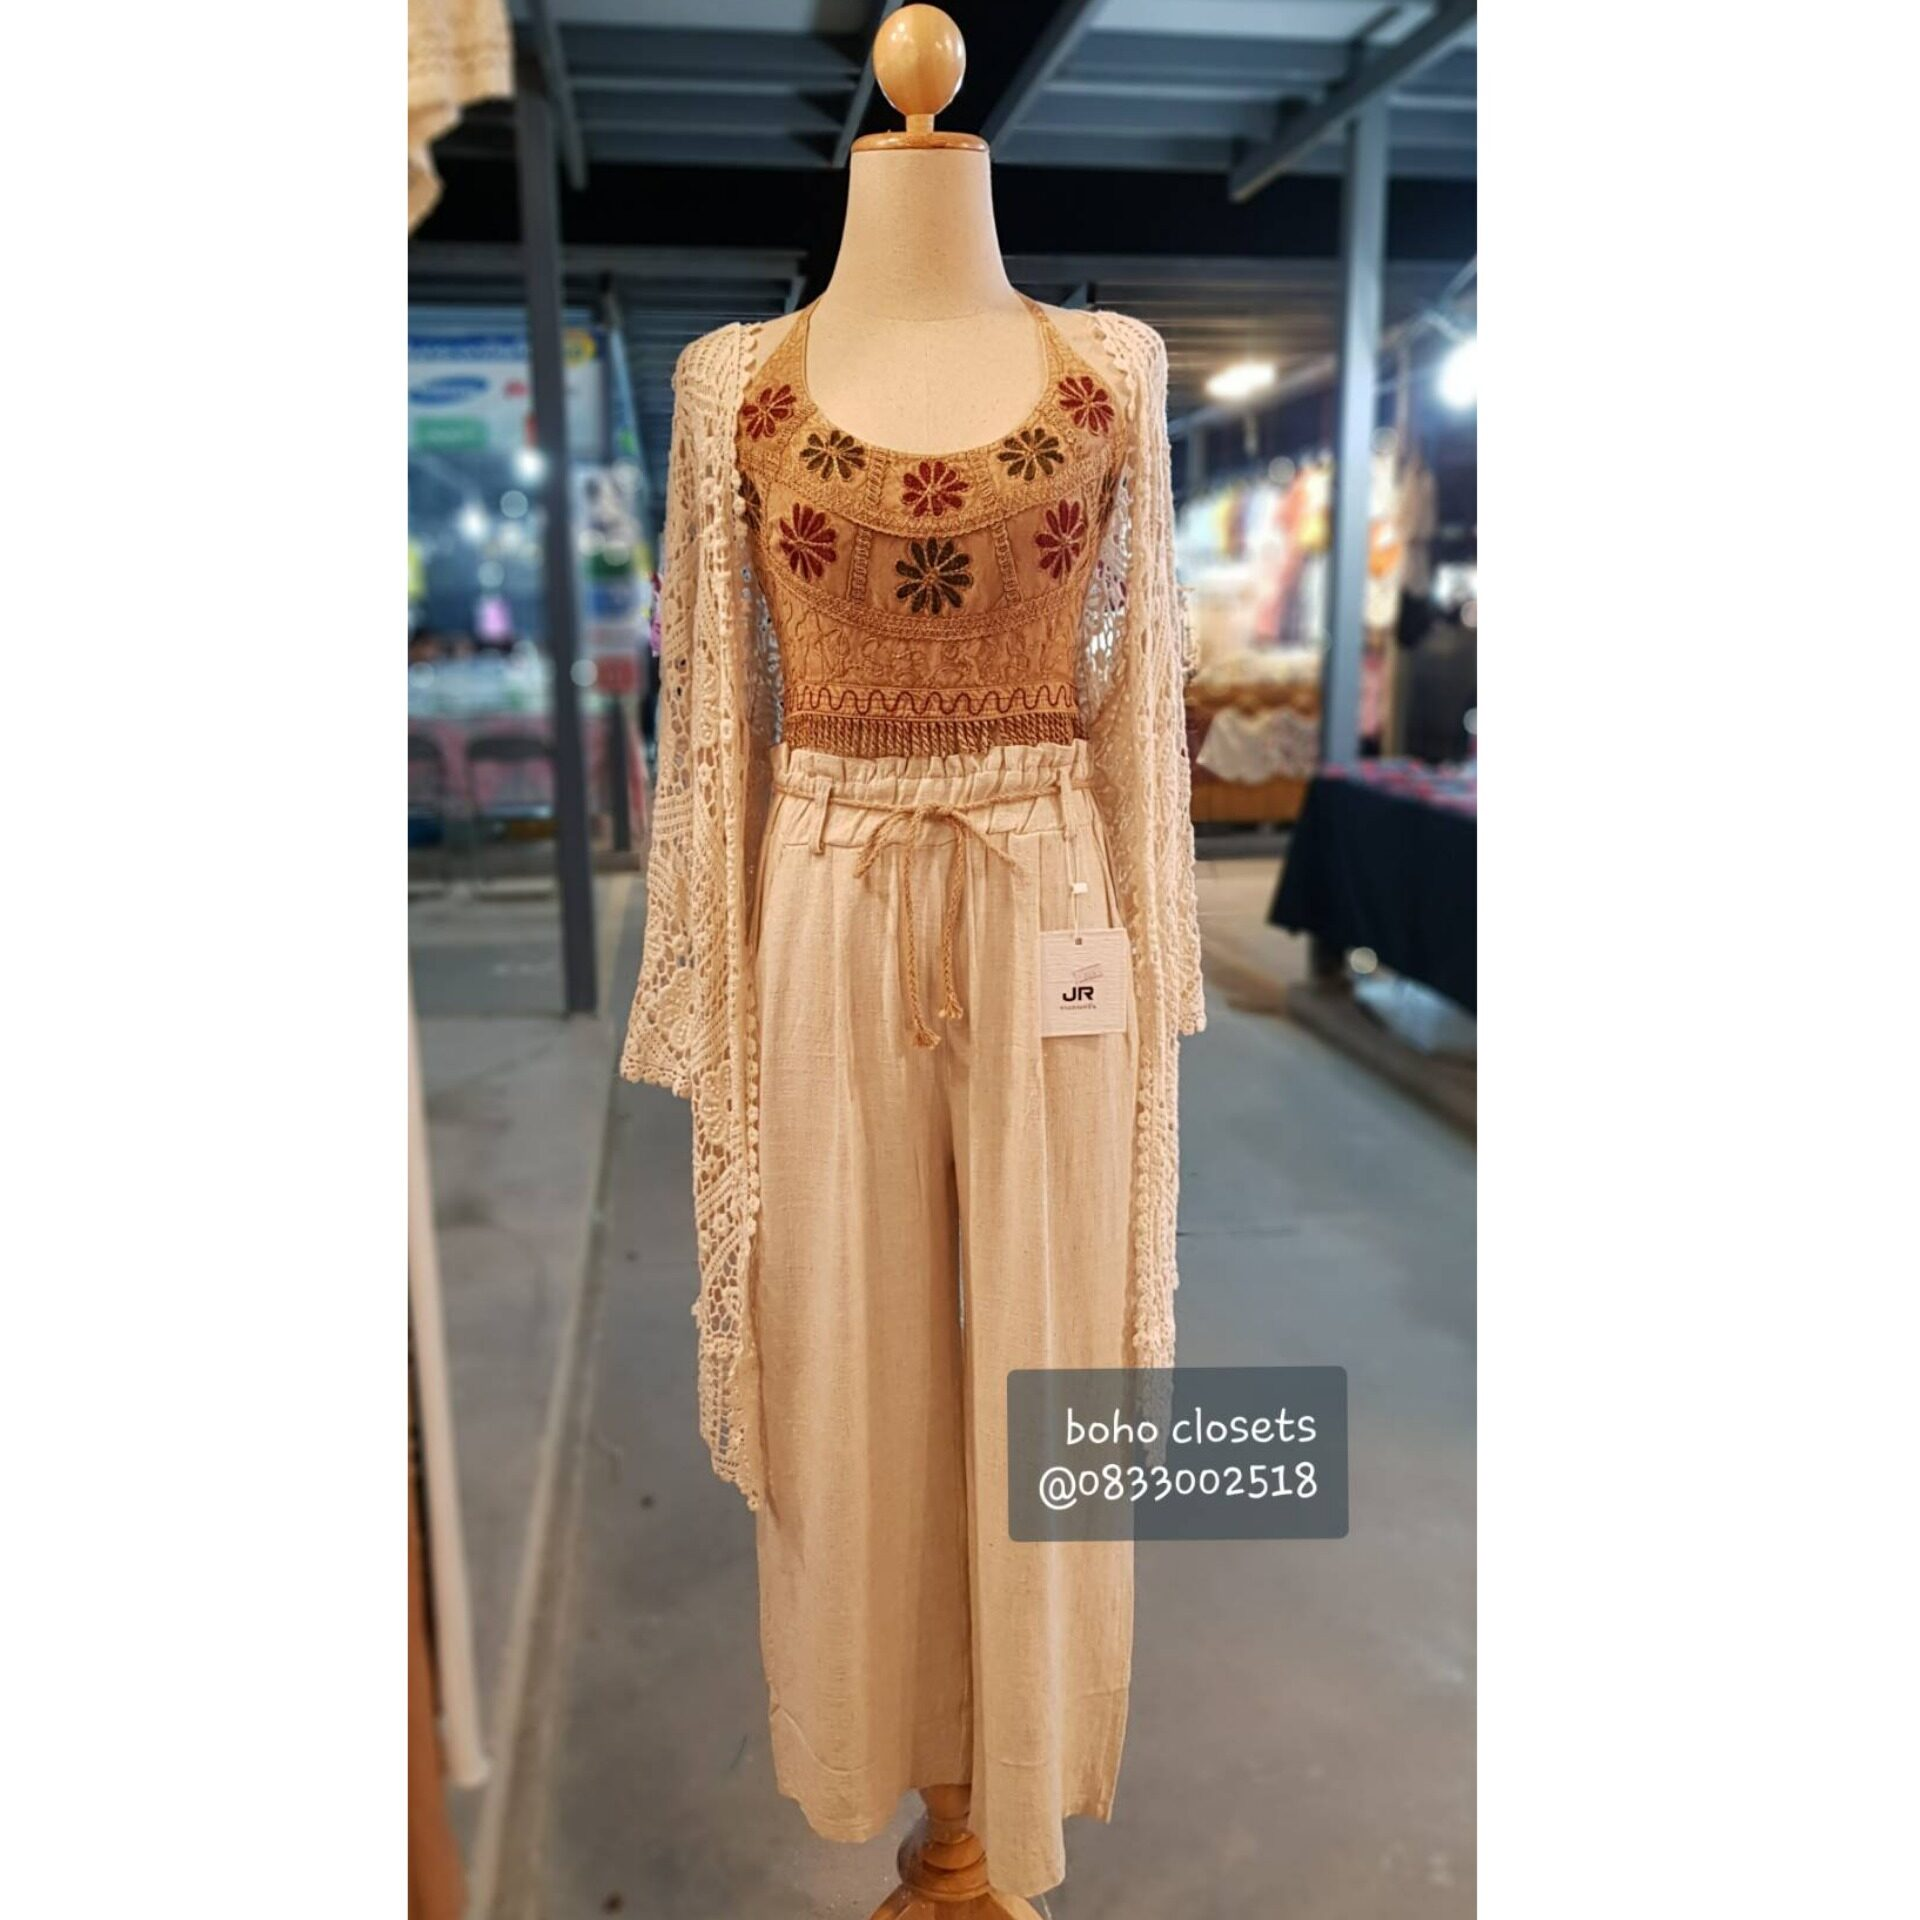 New !! เซ็ตเสื้อคลุมโบฮีเมียน สุดคุ้ม !! By Boho Closets (เสื้อคลุม +เกาะอกคล้องคออินเดีย+ กางเกงผ้าฝ้ายลินิน) งานใส่สบายใส่แยกชิ้นได้จ้า แมทได้หลากหลายสไตล์ โบฮีเมียน อินเดียน คาวบอย แฟชั่น  เสื้อคลุมแมทเซ็ตบีกินนี่ไปทะเลสุด Sexy น่ารักสุดๆจ้า.